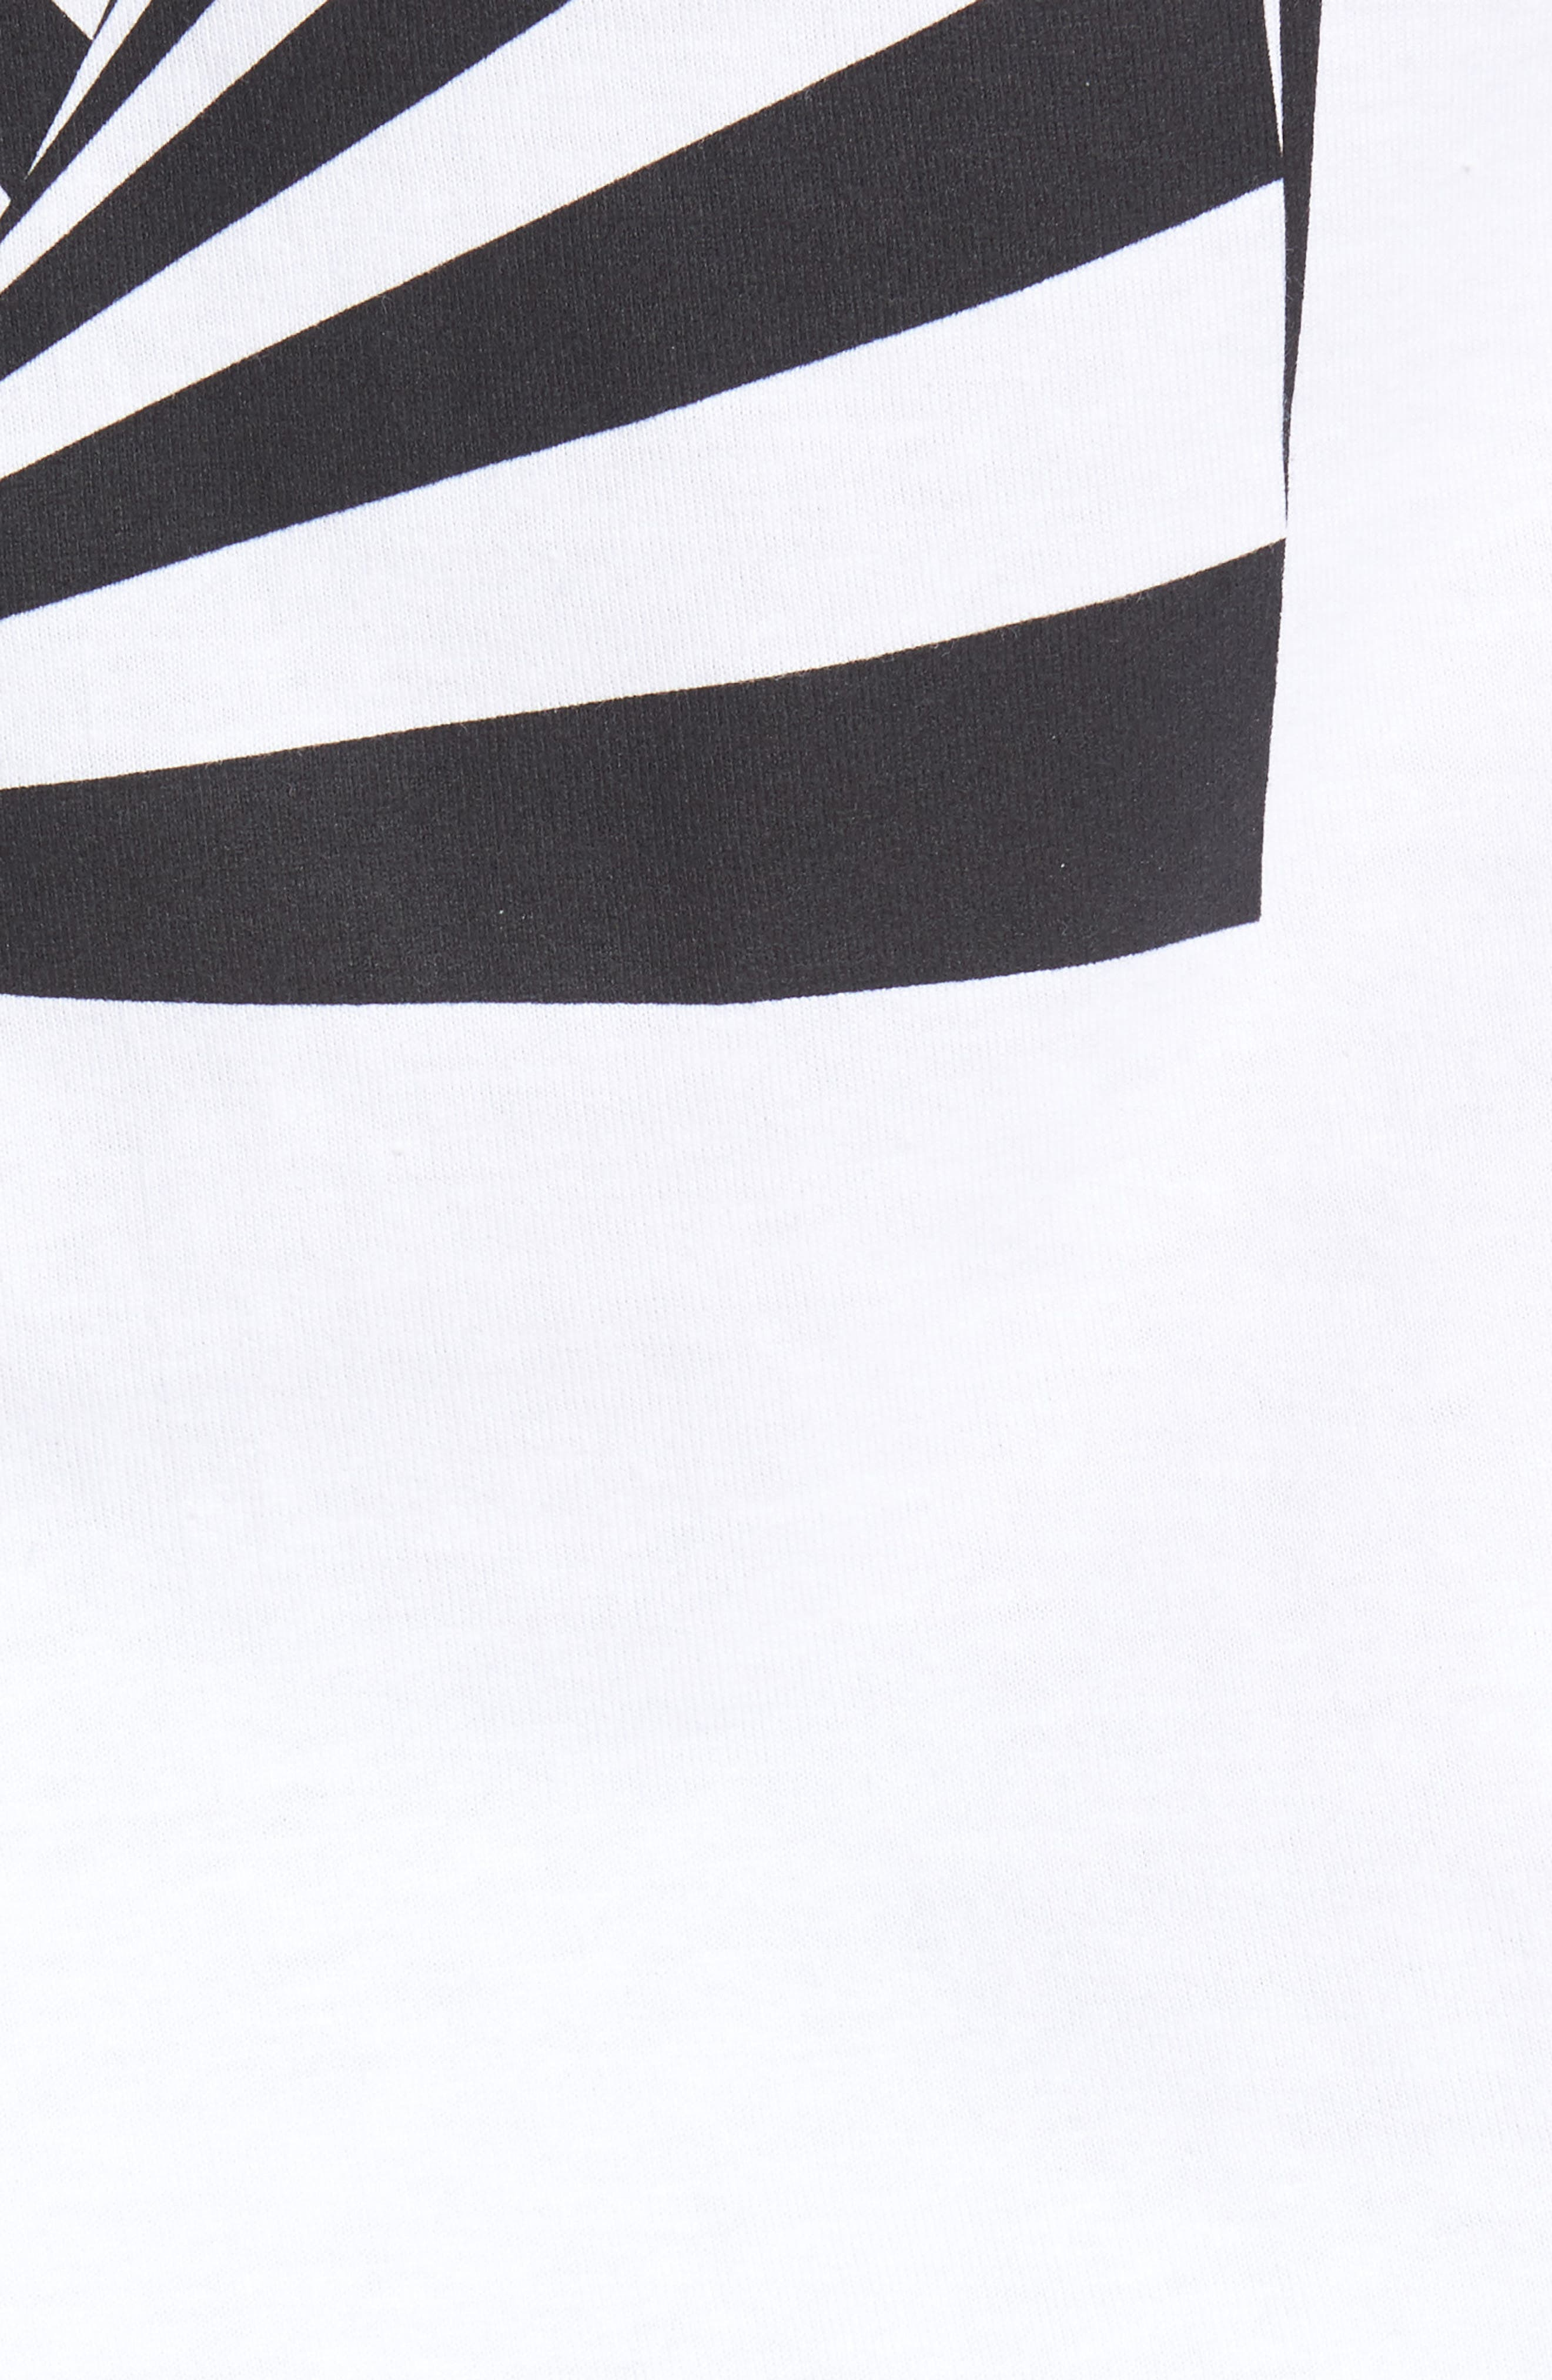 Vision Street Wear Long Sleeve T-Shirt,                             Alternate thumbnail 6, color,                             100